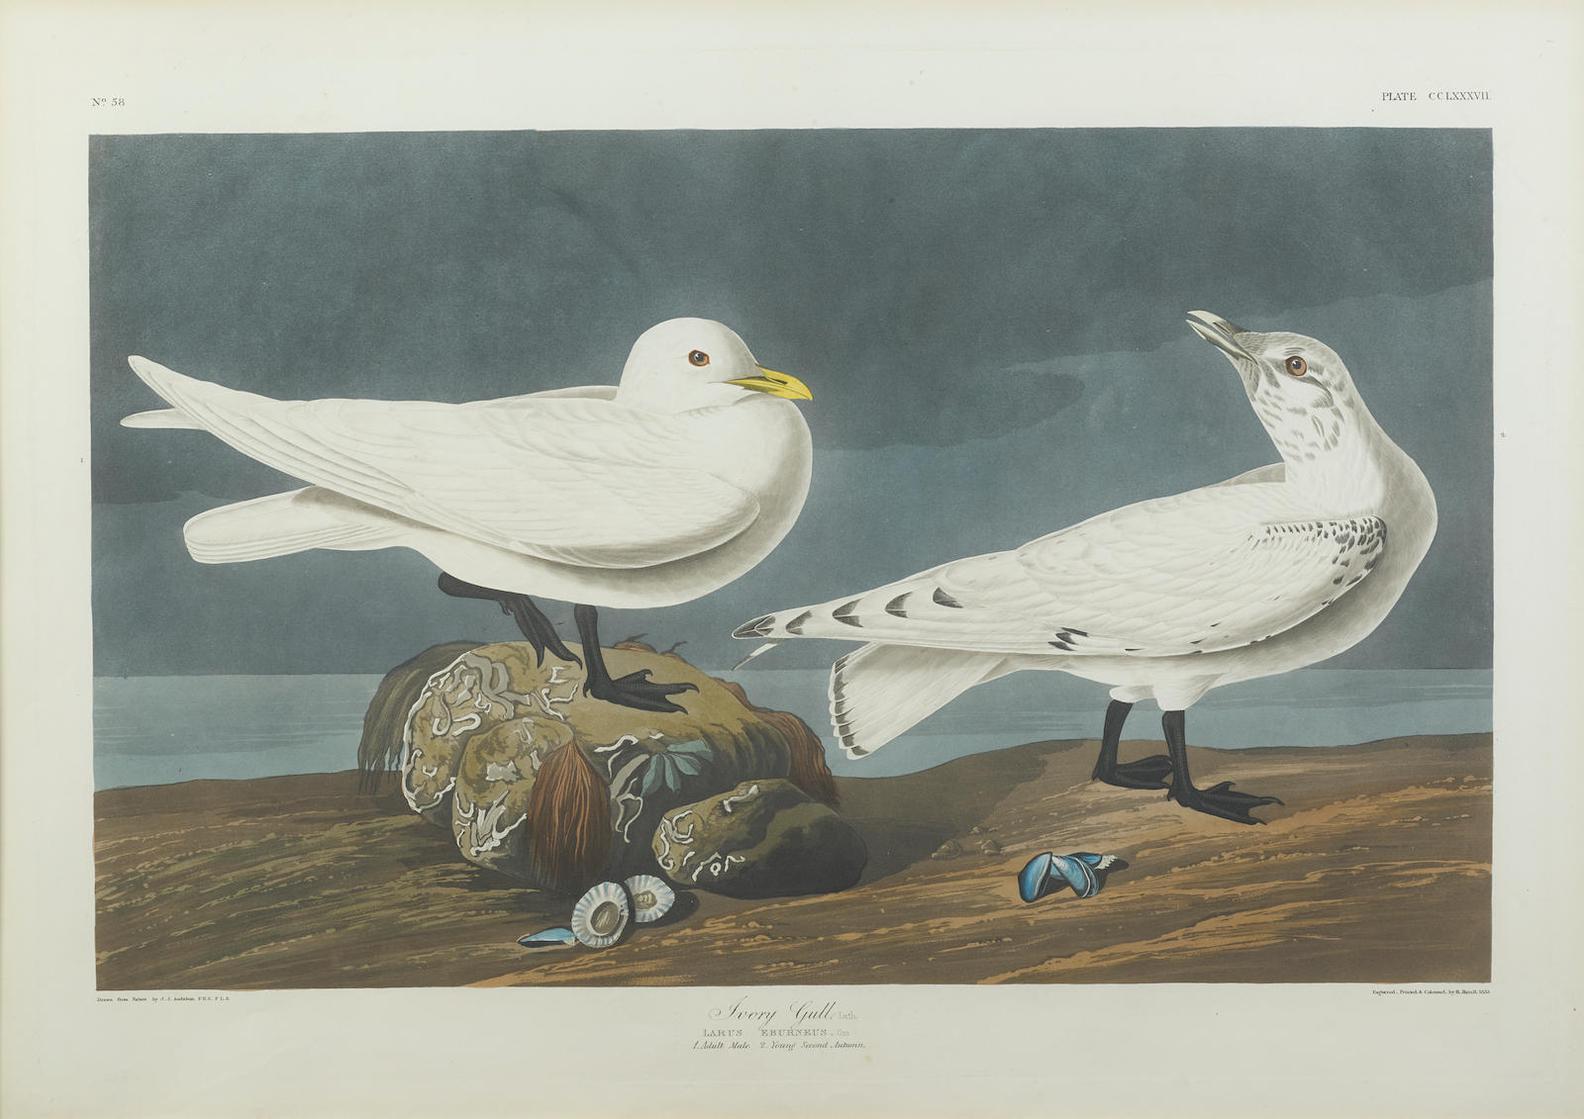 John James Audubon-After John James Audubon - Ivory Gull (Pl. CCLXXXVII); Foolish Guillemot (Pl. CCXVIII); Slender-Billed Guillemot (Pl. CCCCXXX)-1838